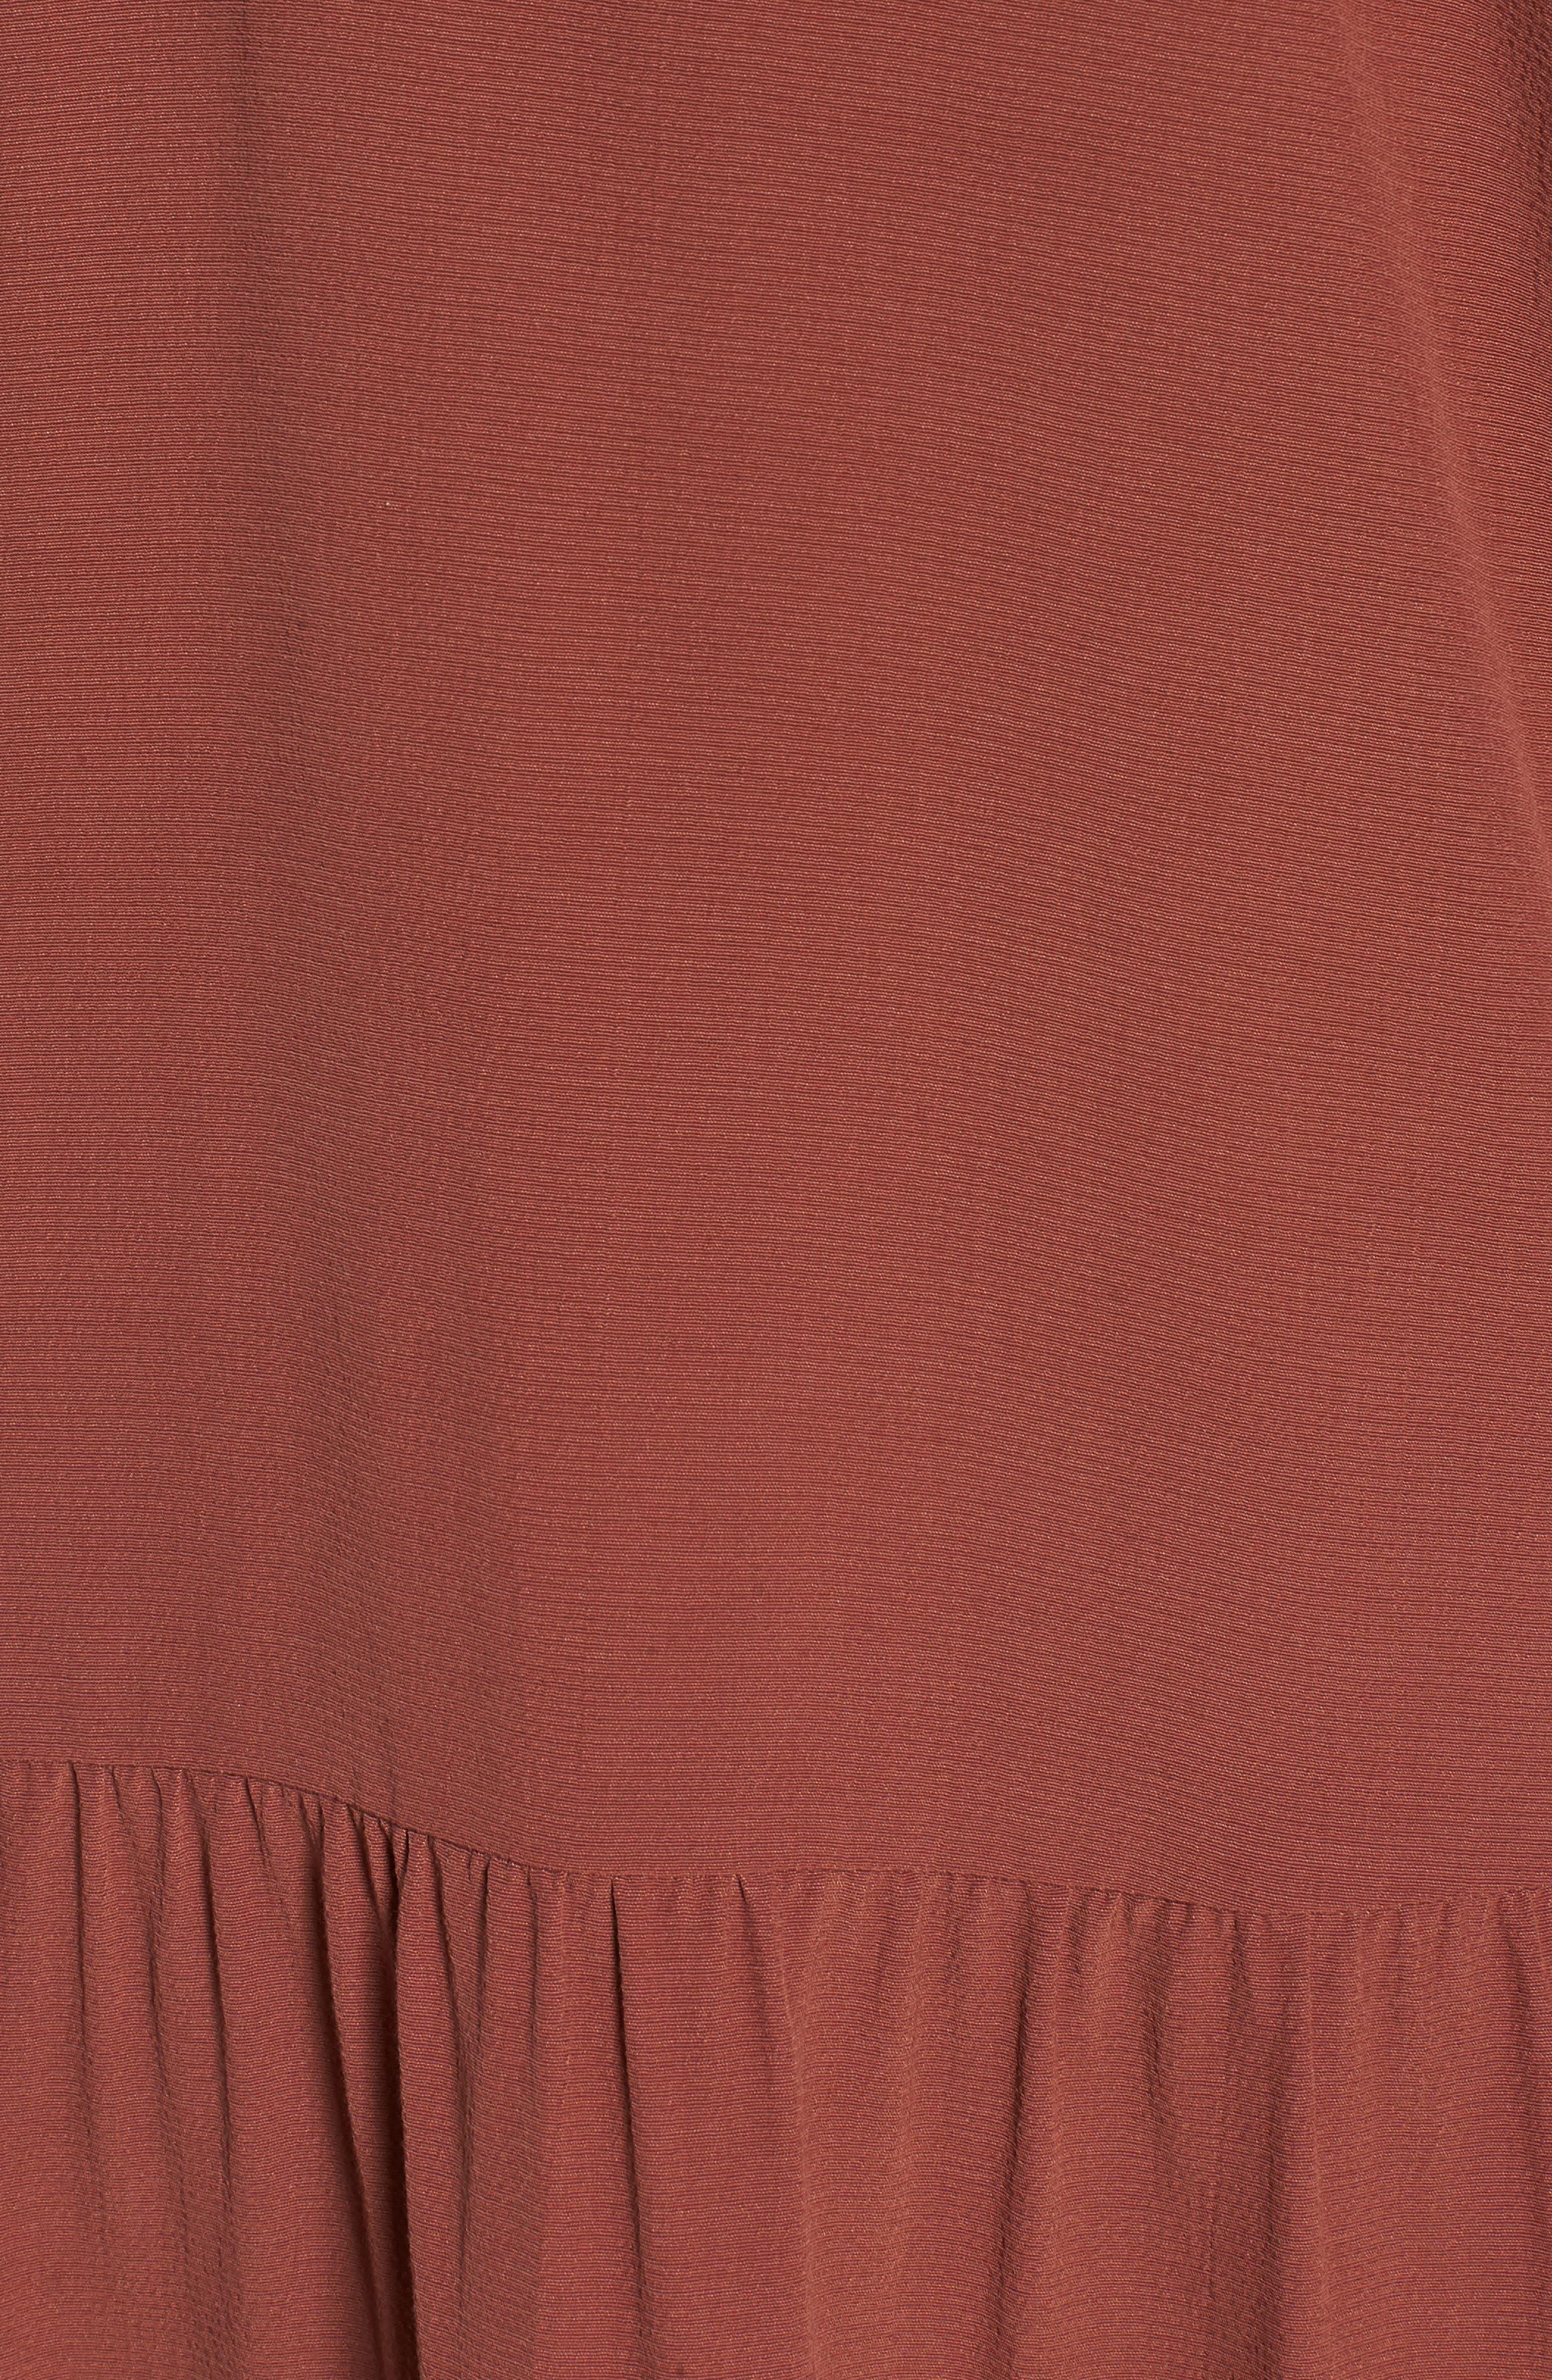 Drop Waist Tencel<sup>®</sup> Lyocell Blend Dress,                             Alternate thumbnail 19, color,